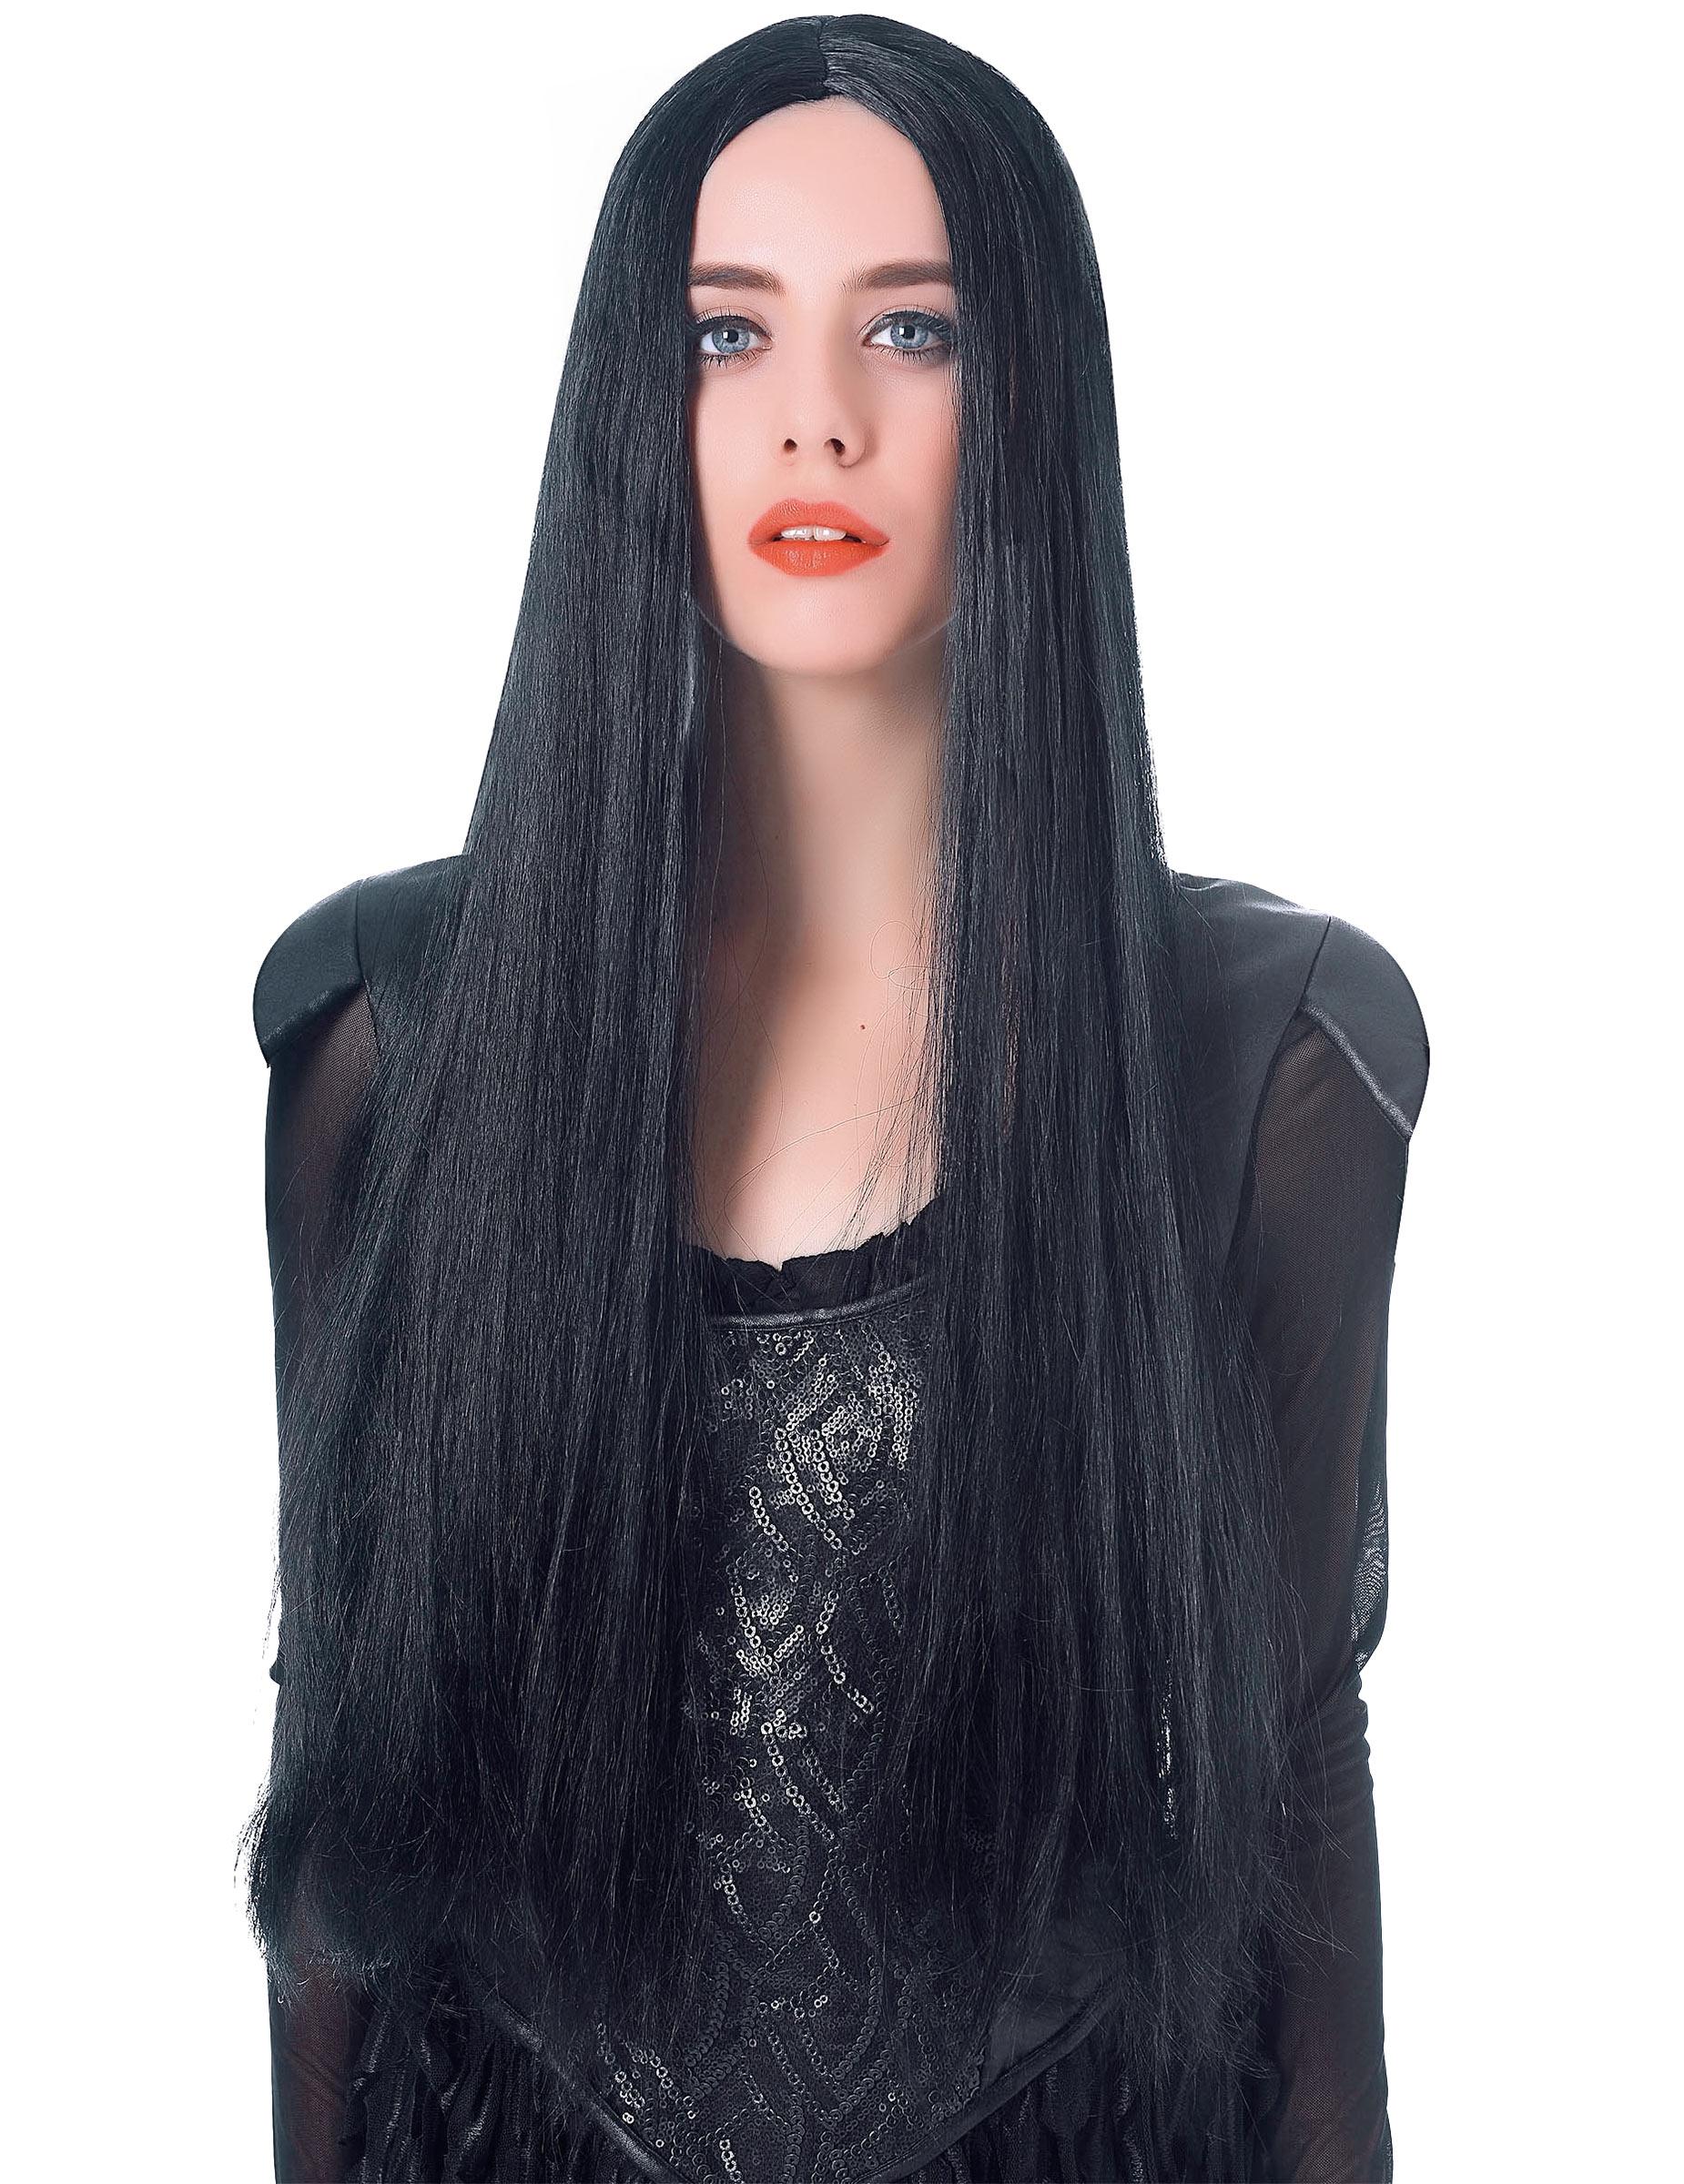 d5ee40a712c7 Parrucca da donna di Halloween lunga 75 cm: Parrucche,e vestiti di ...